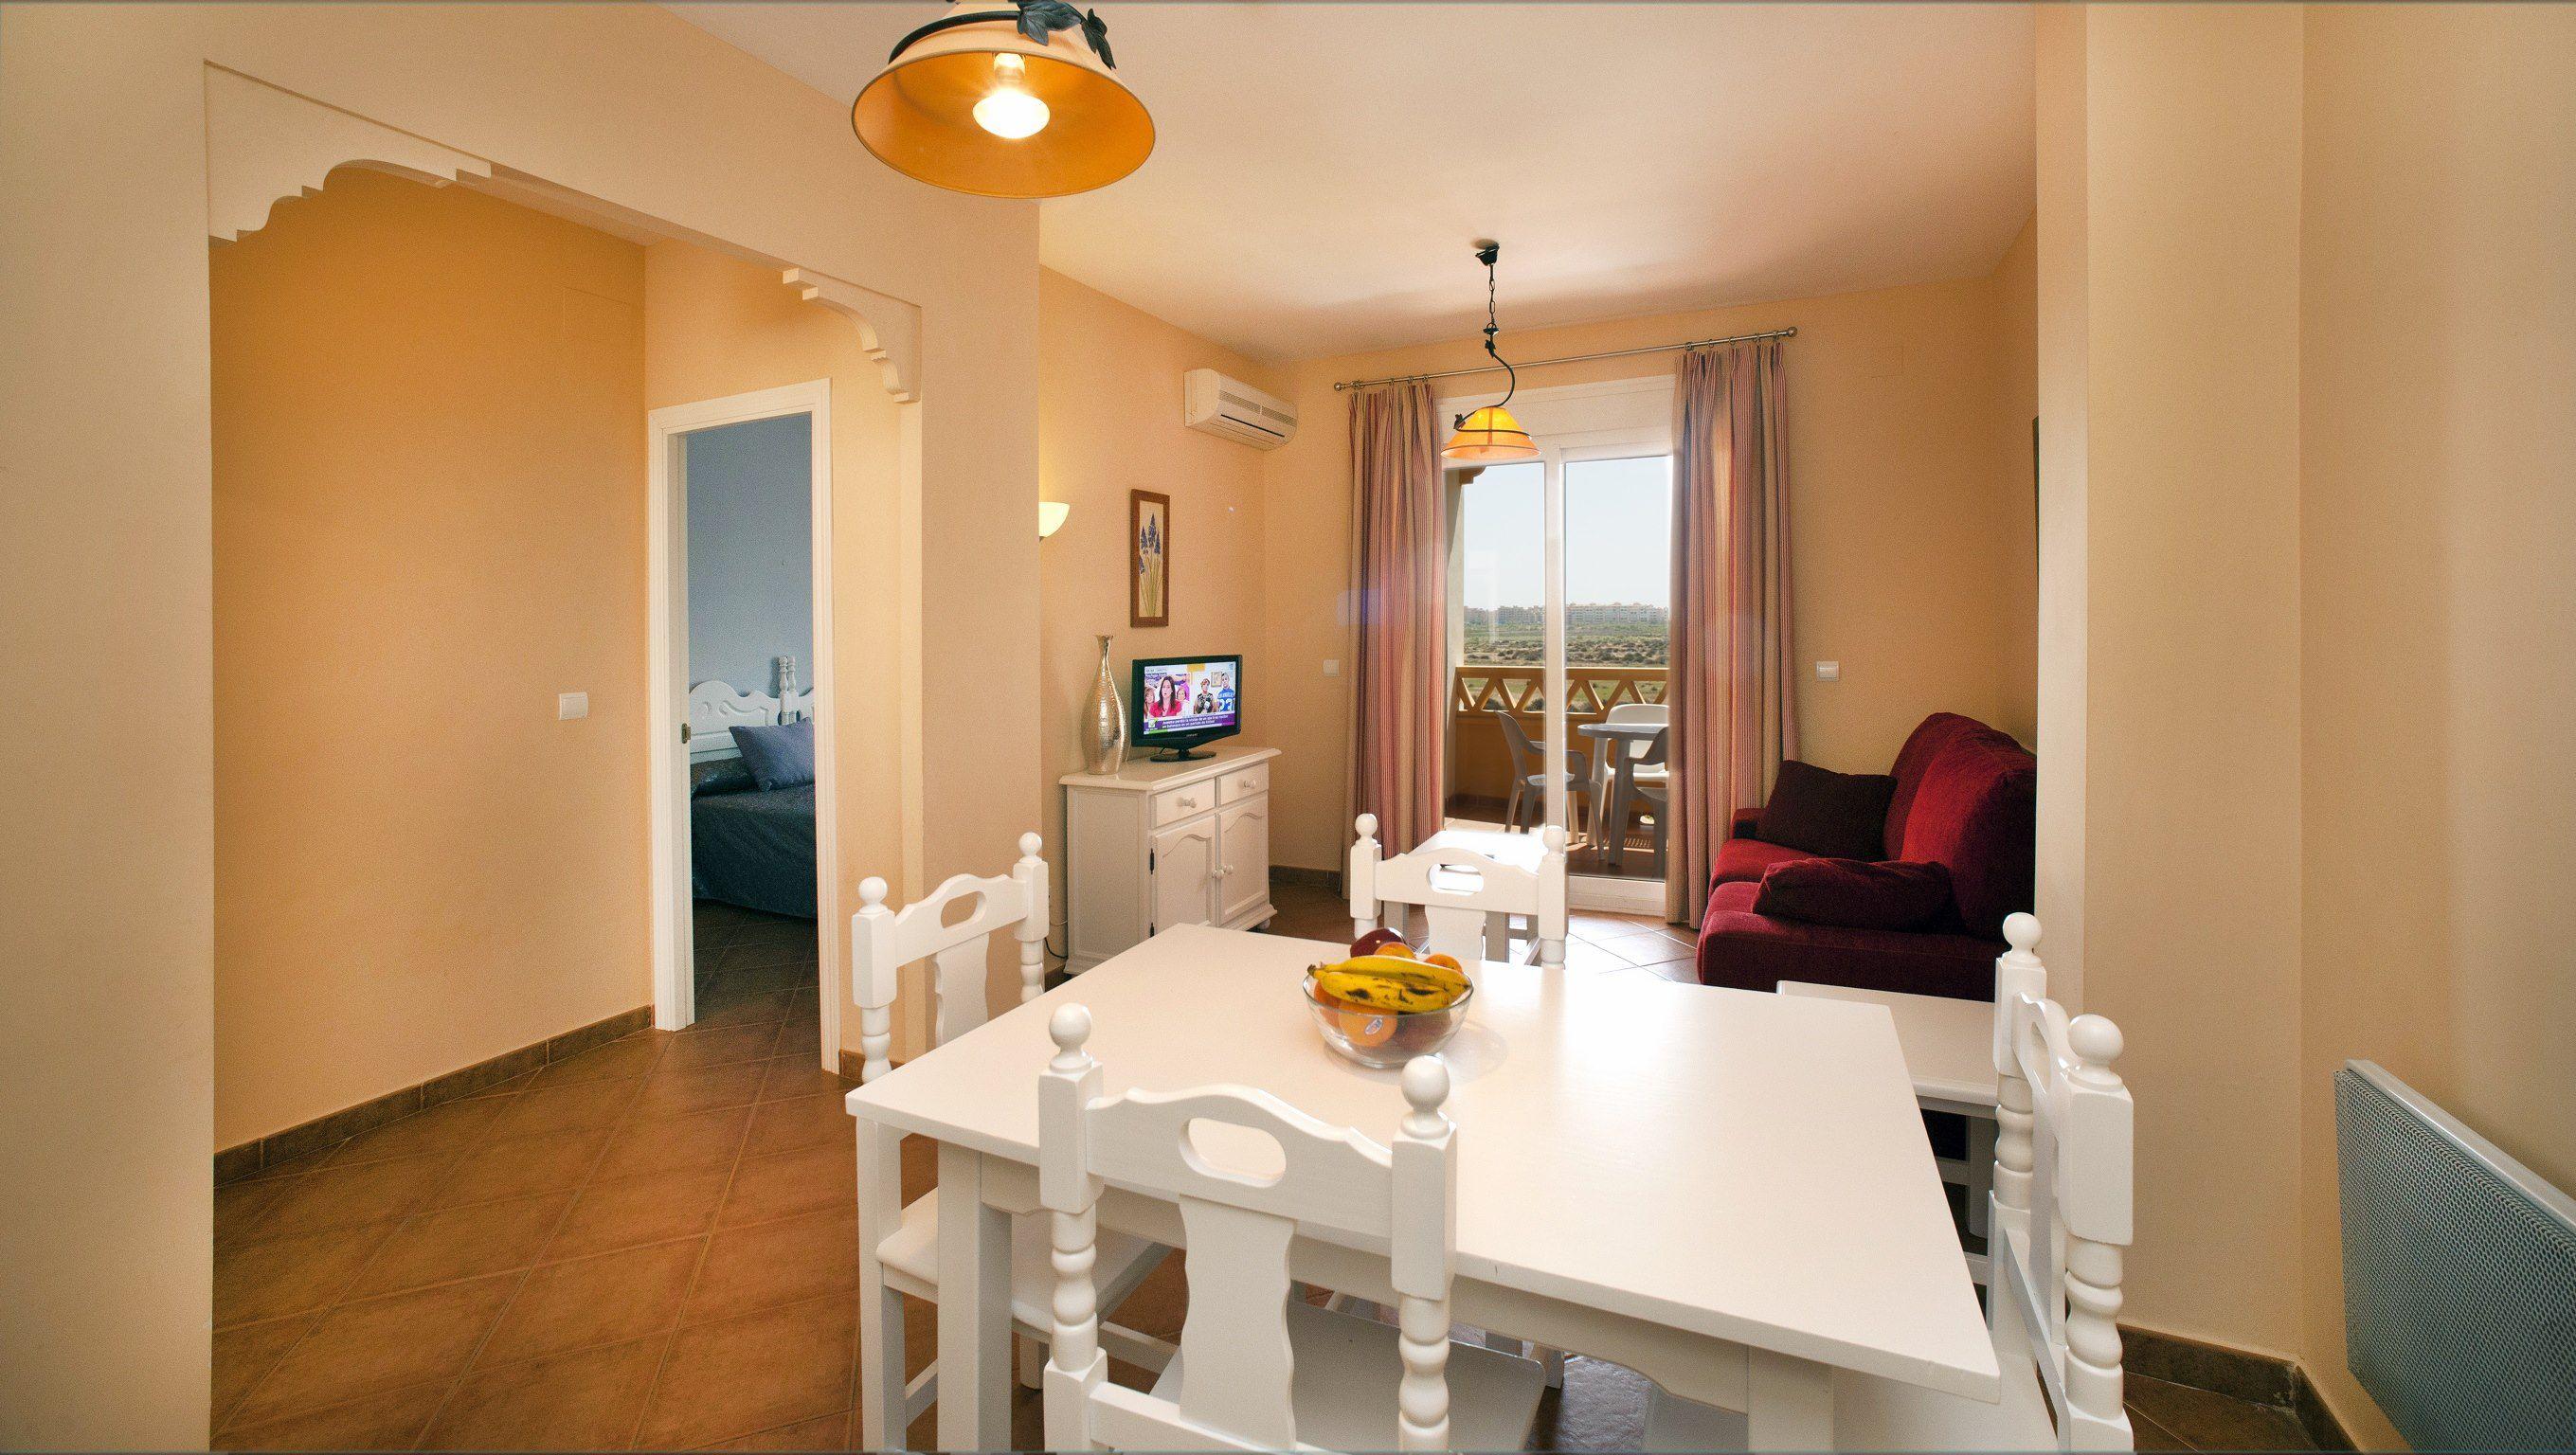 Apartamento 1 dormitorio  del hotel Leo Canela. Foto 2